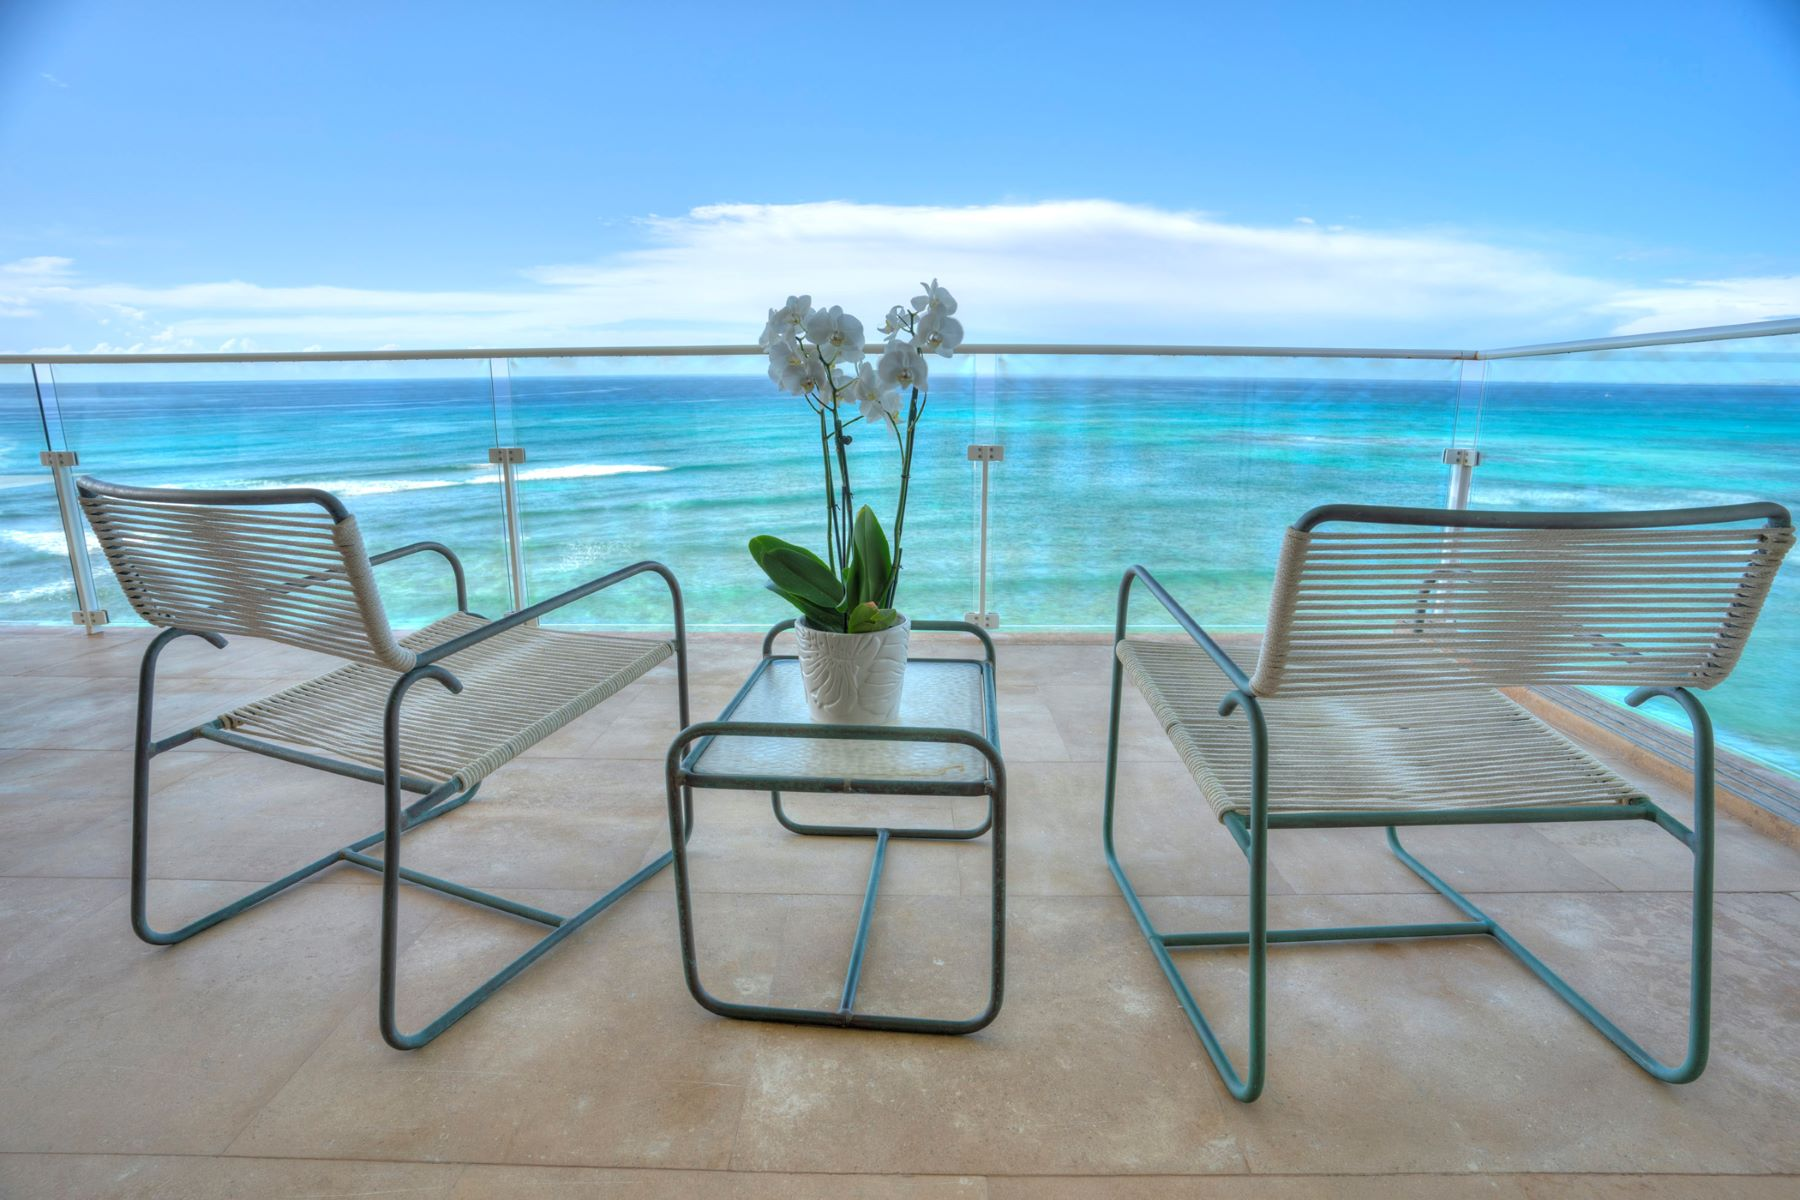 Condominiums 为 销售 在 Stylish Diamond Head Retreat, Ocean Front, Ocean Views, Sunset Views 3019 Kalakaua Avenue #8 火奴鲁鲁, 夏威夷 96815 美国